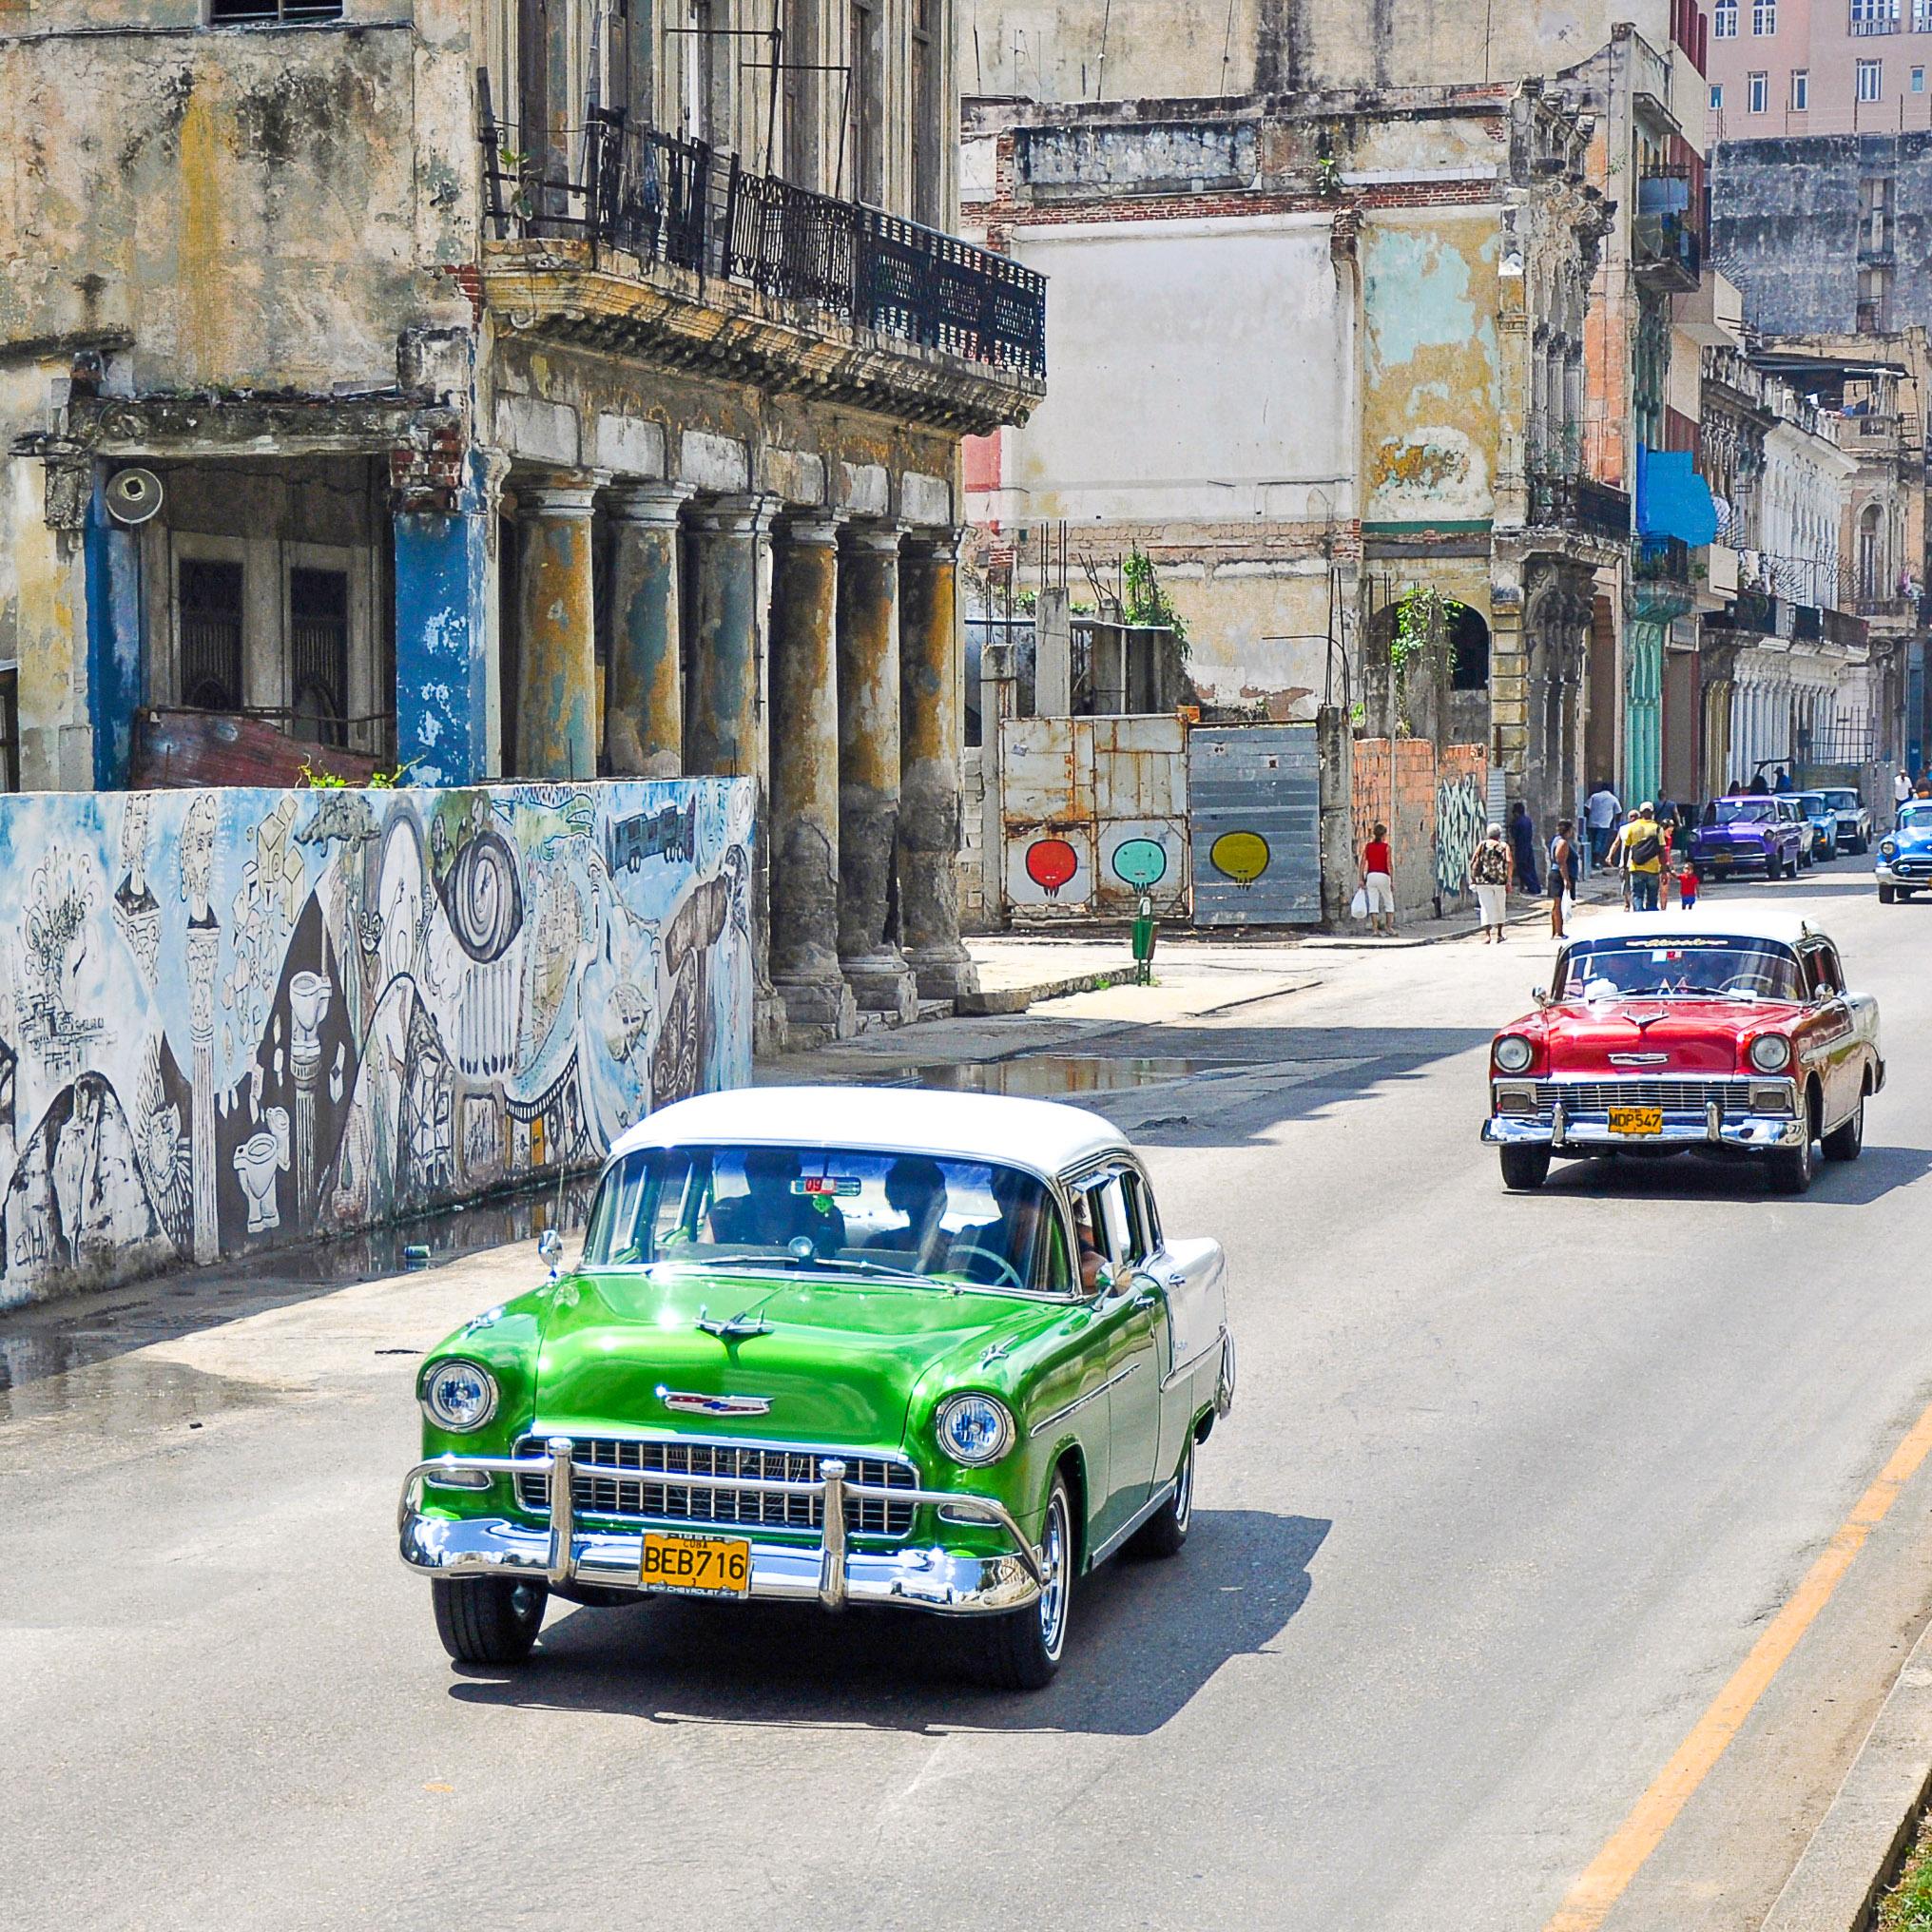 151214 Cuba Car Red Green-1283130602.jpg